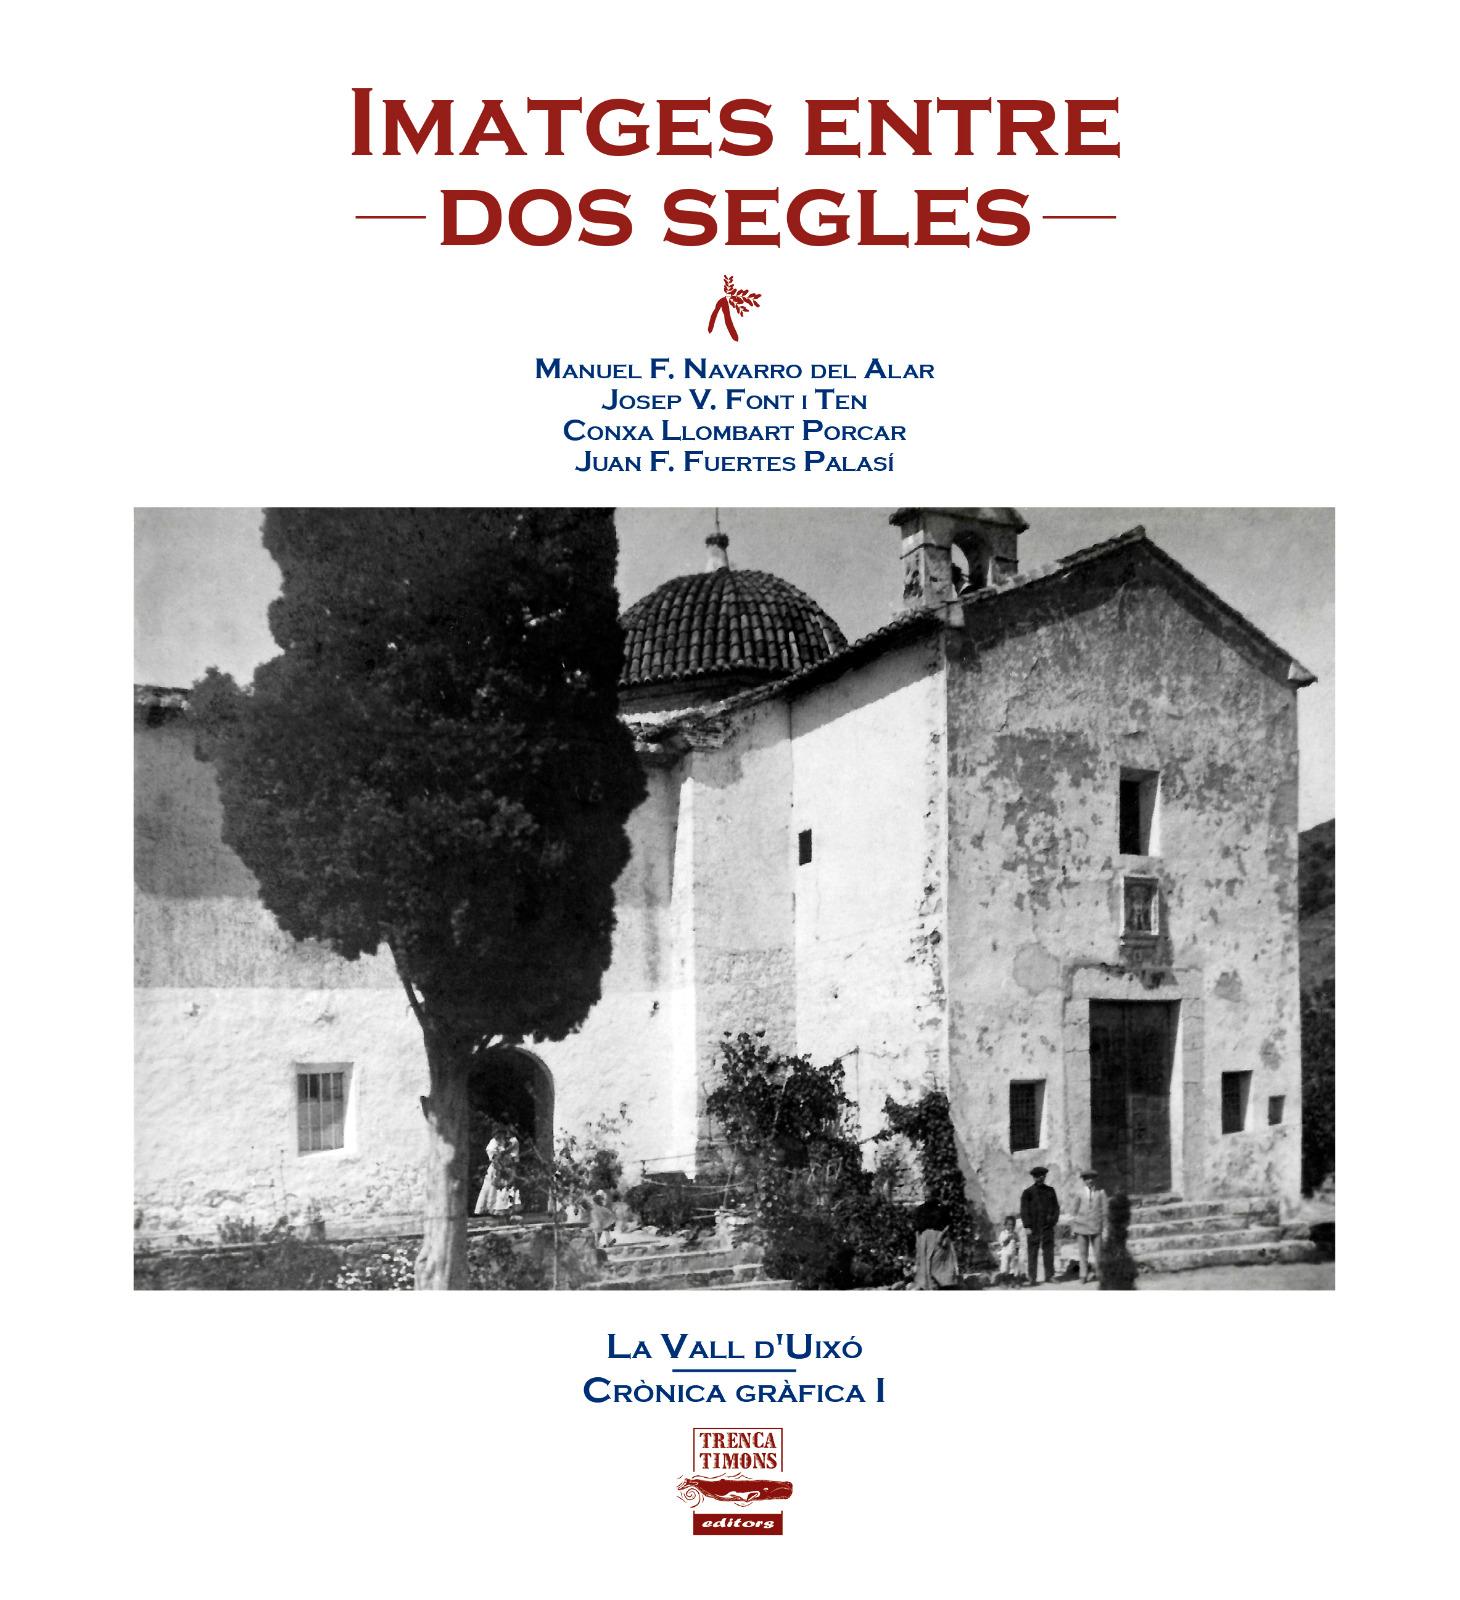 Imatges entre dos segles